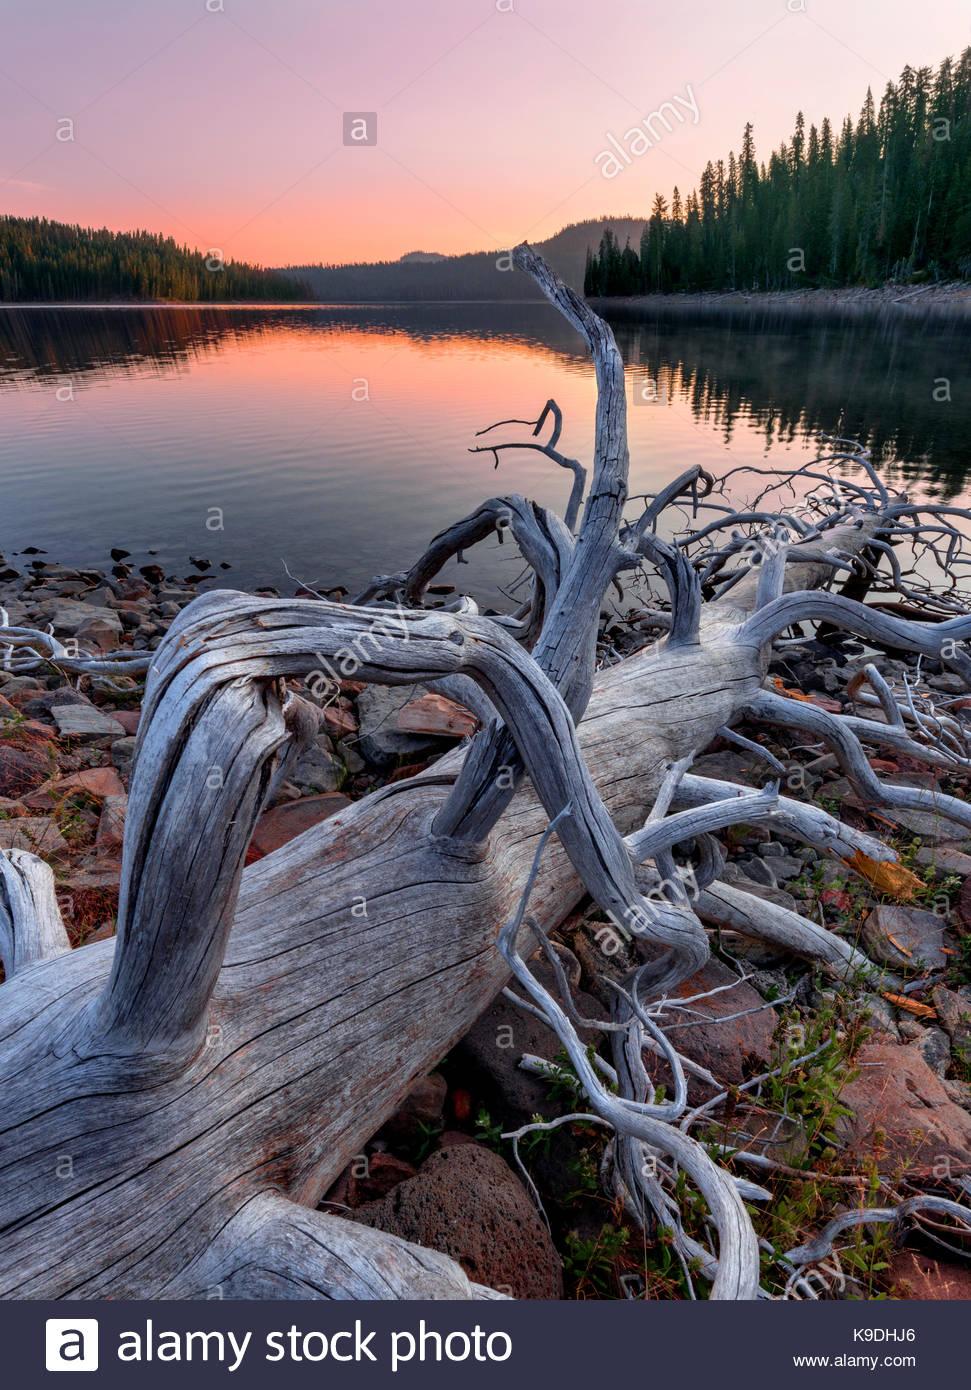 Snag and Juniper Lake at Dawn, Lassen Volcanic National Park, California - Stock Image